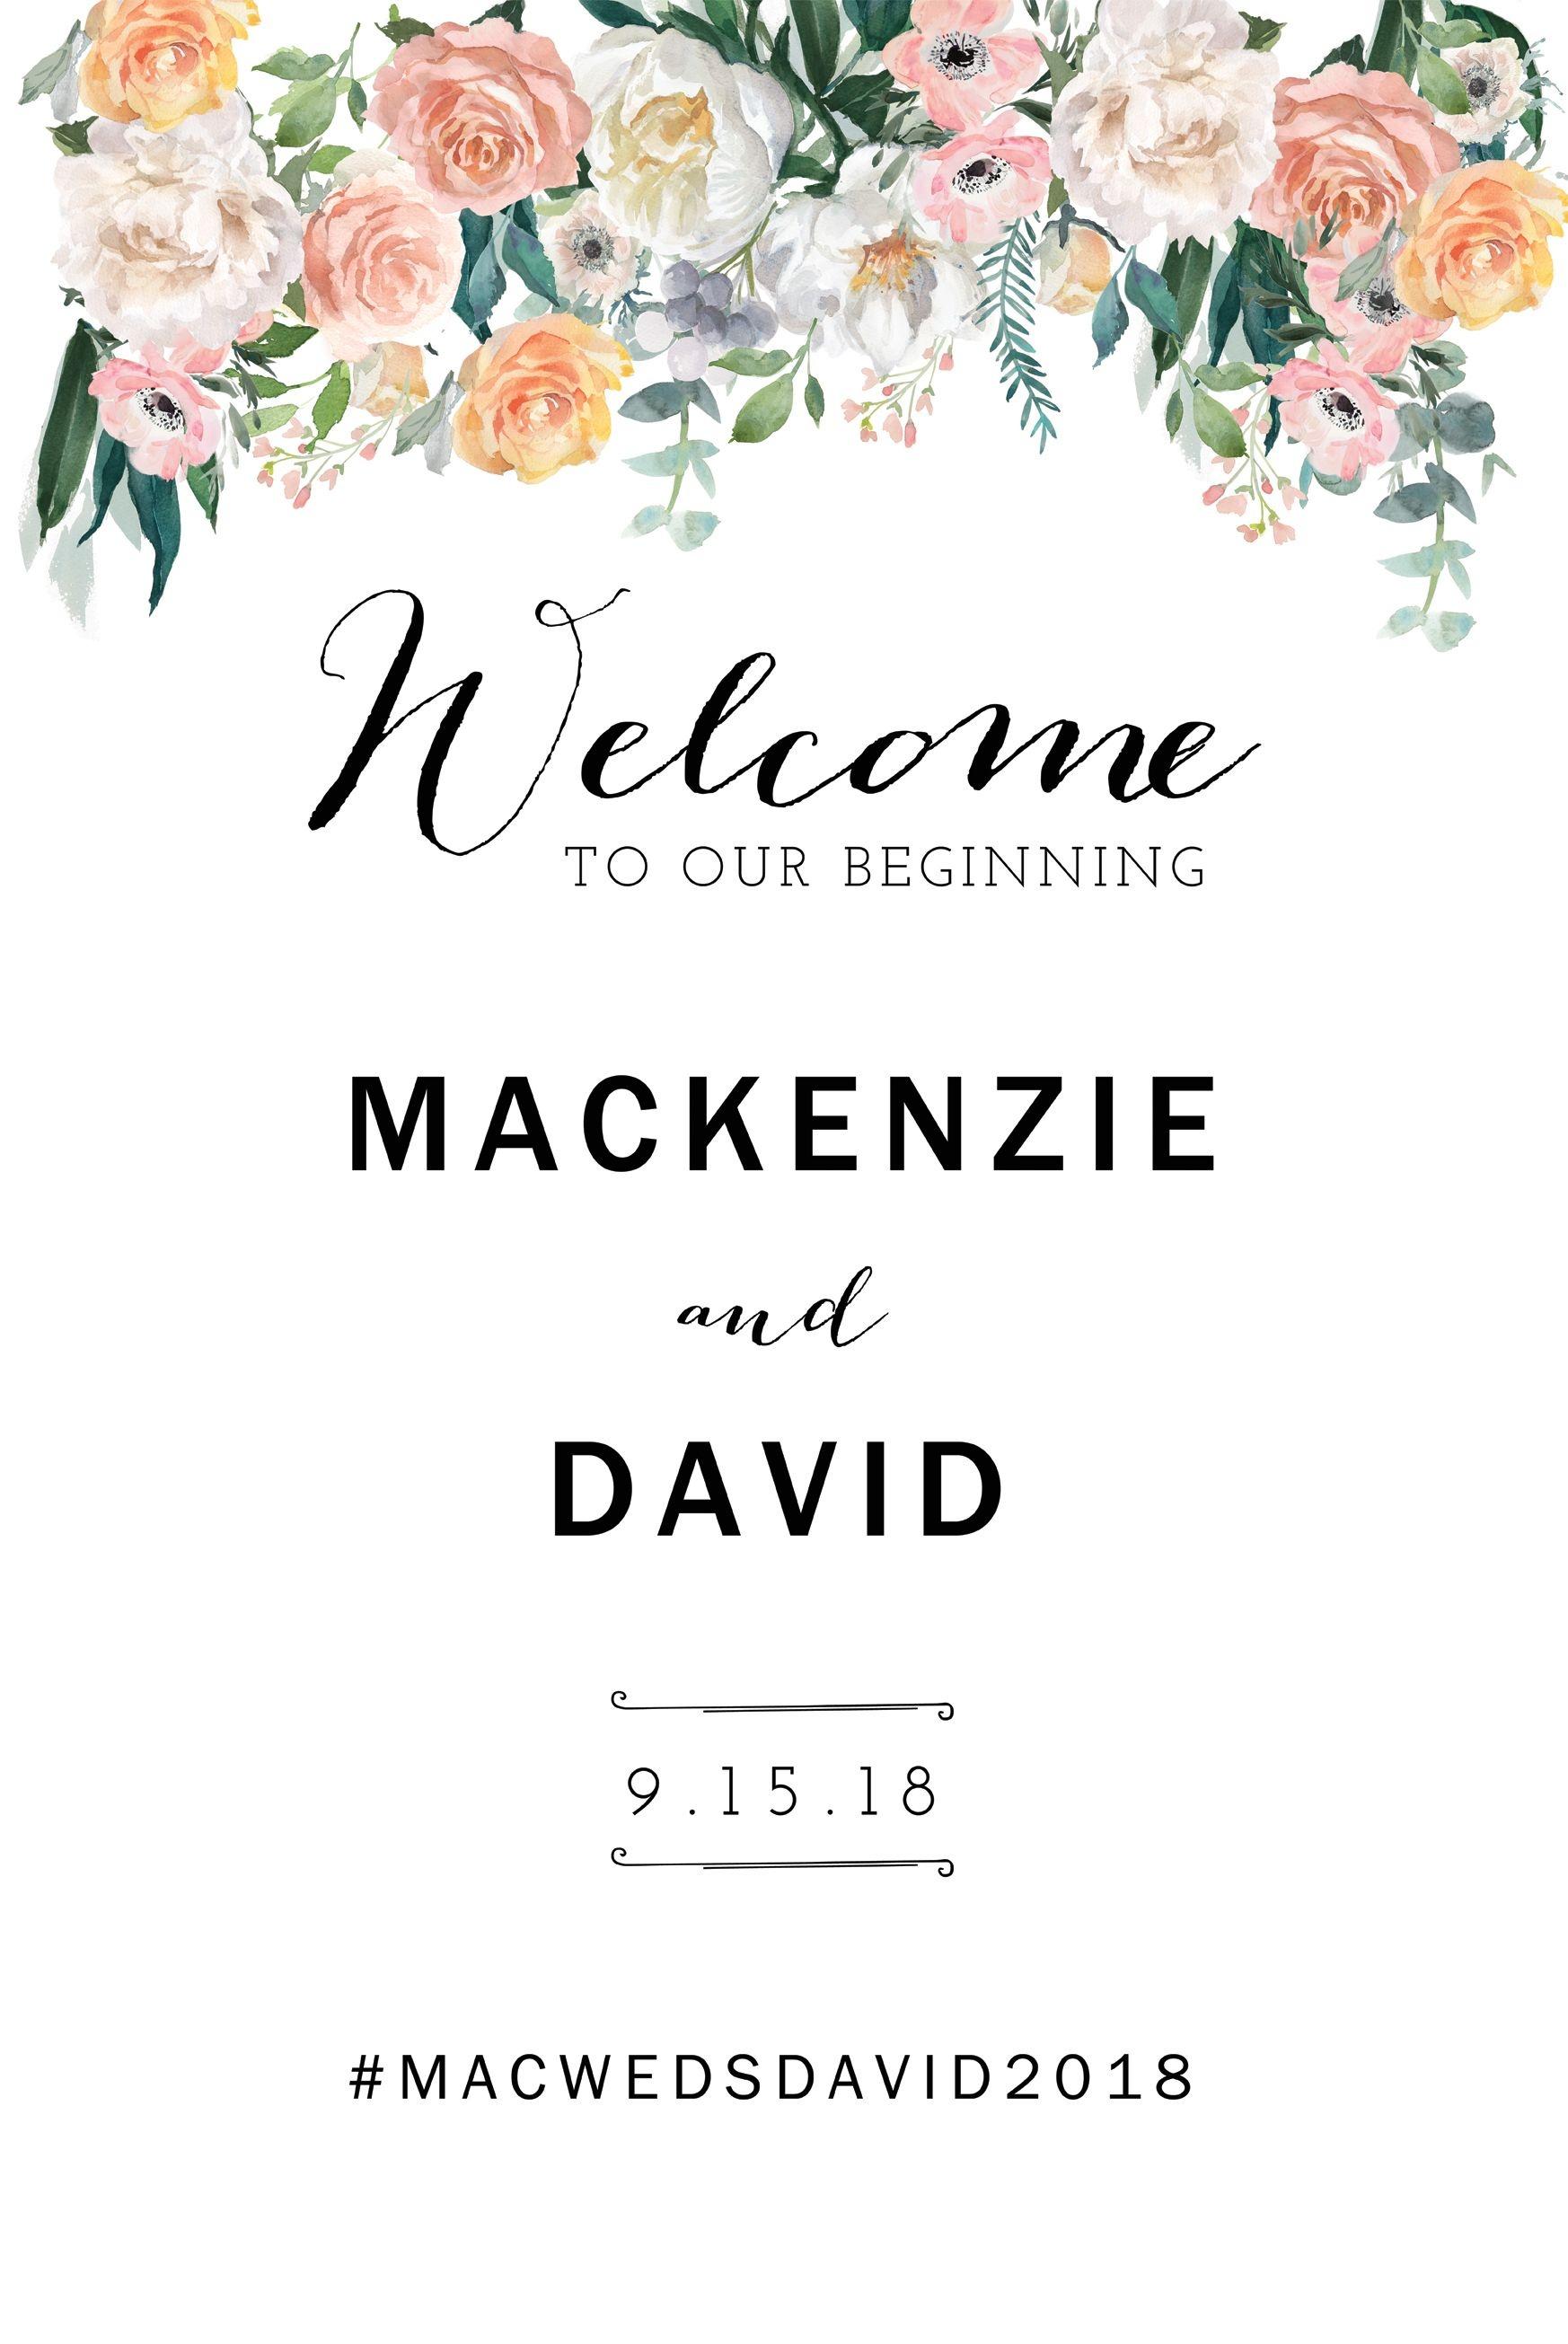 Wedding Welcome Sign Template, Printable Wedding Welcome Sign, Diy - Free Printable Welcome Sign Template